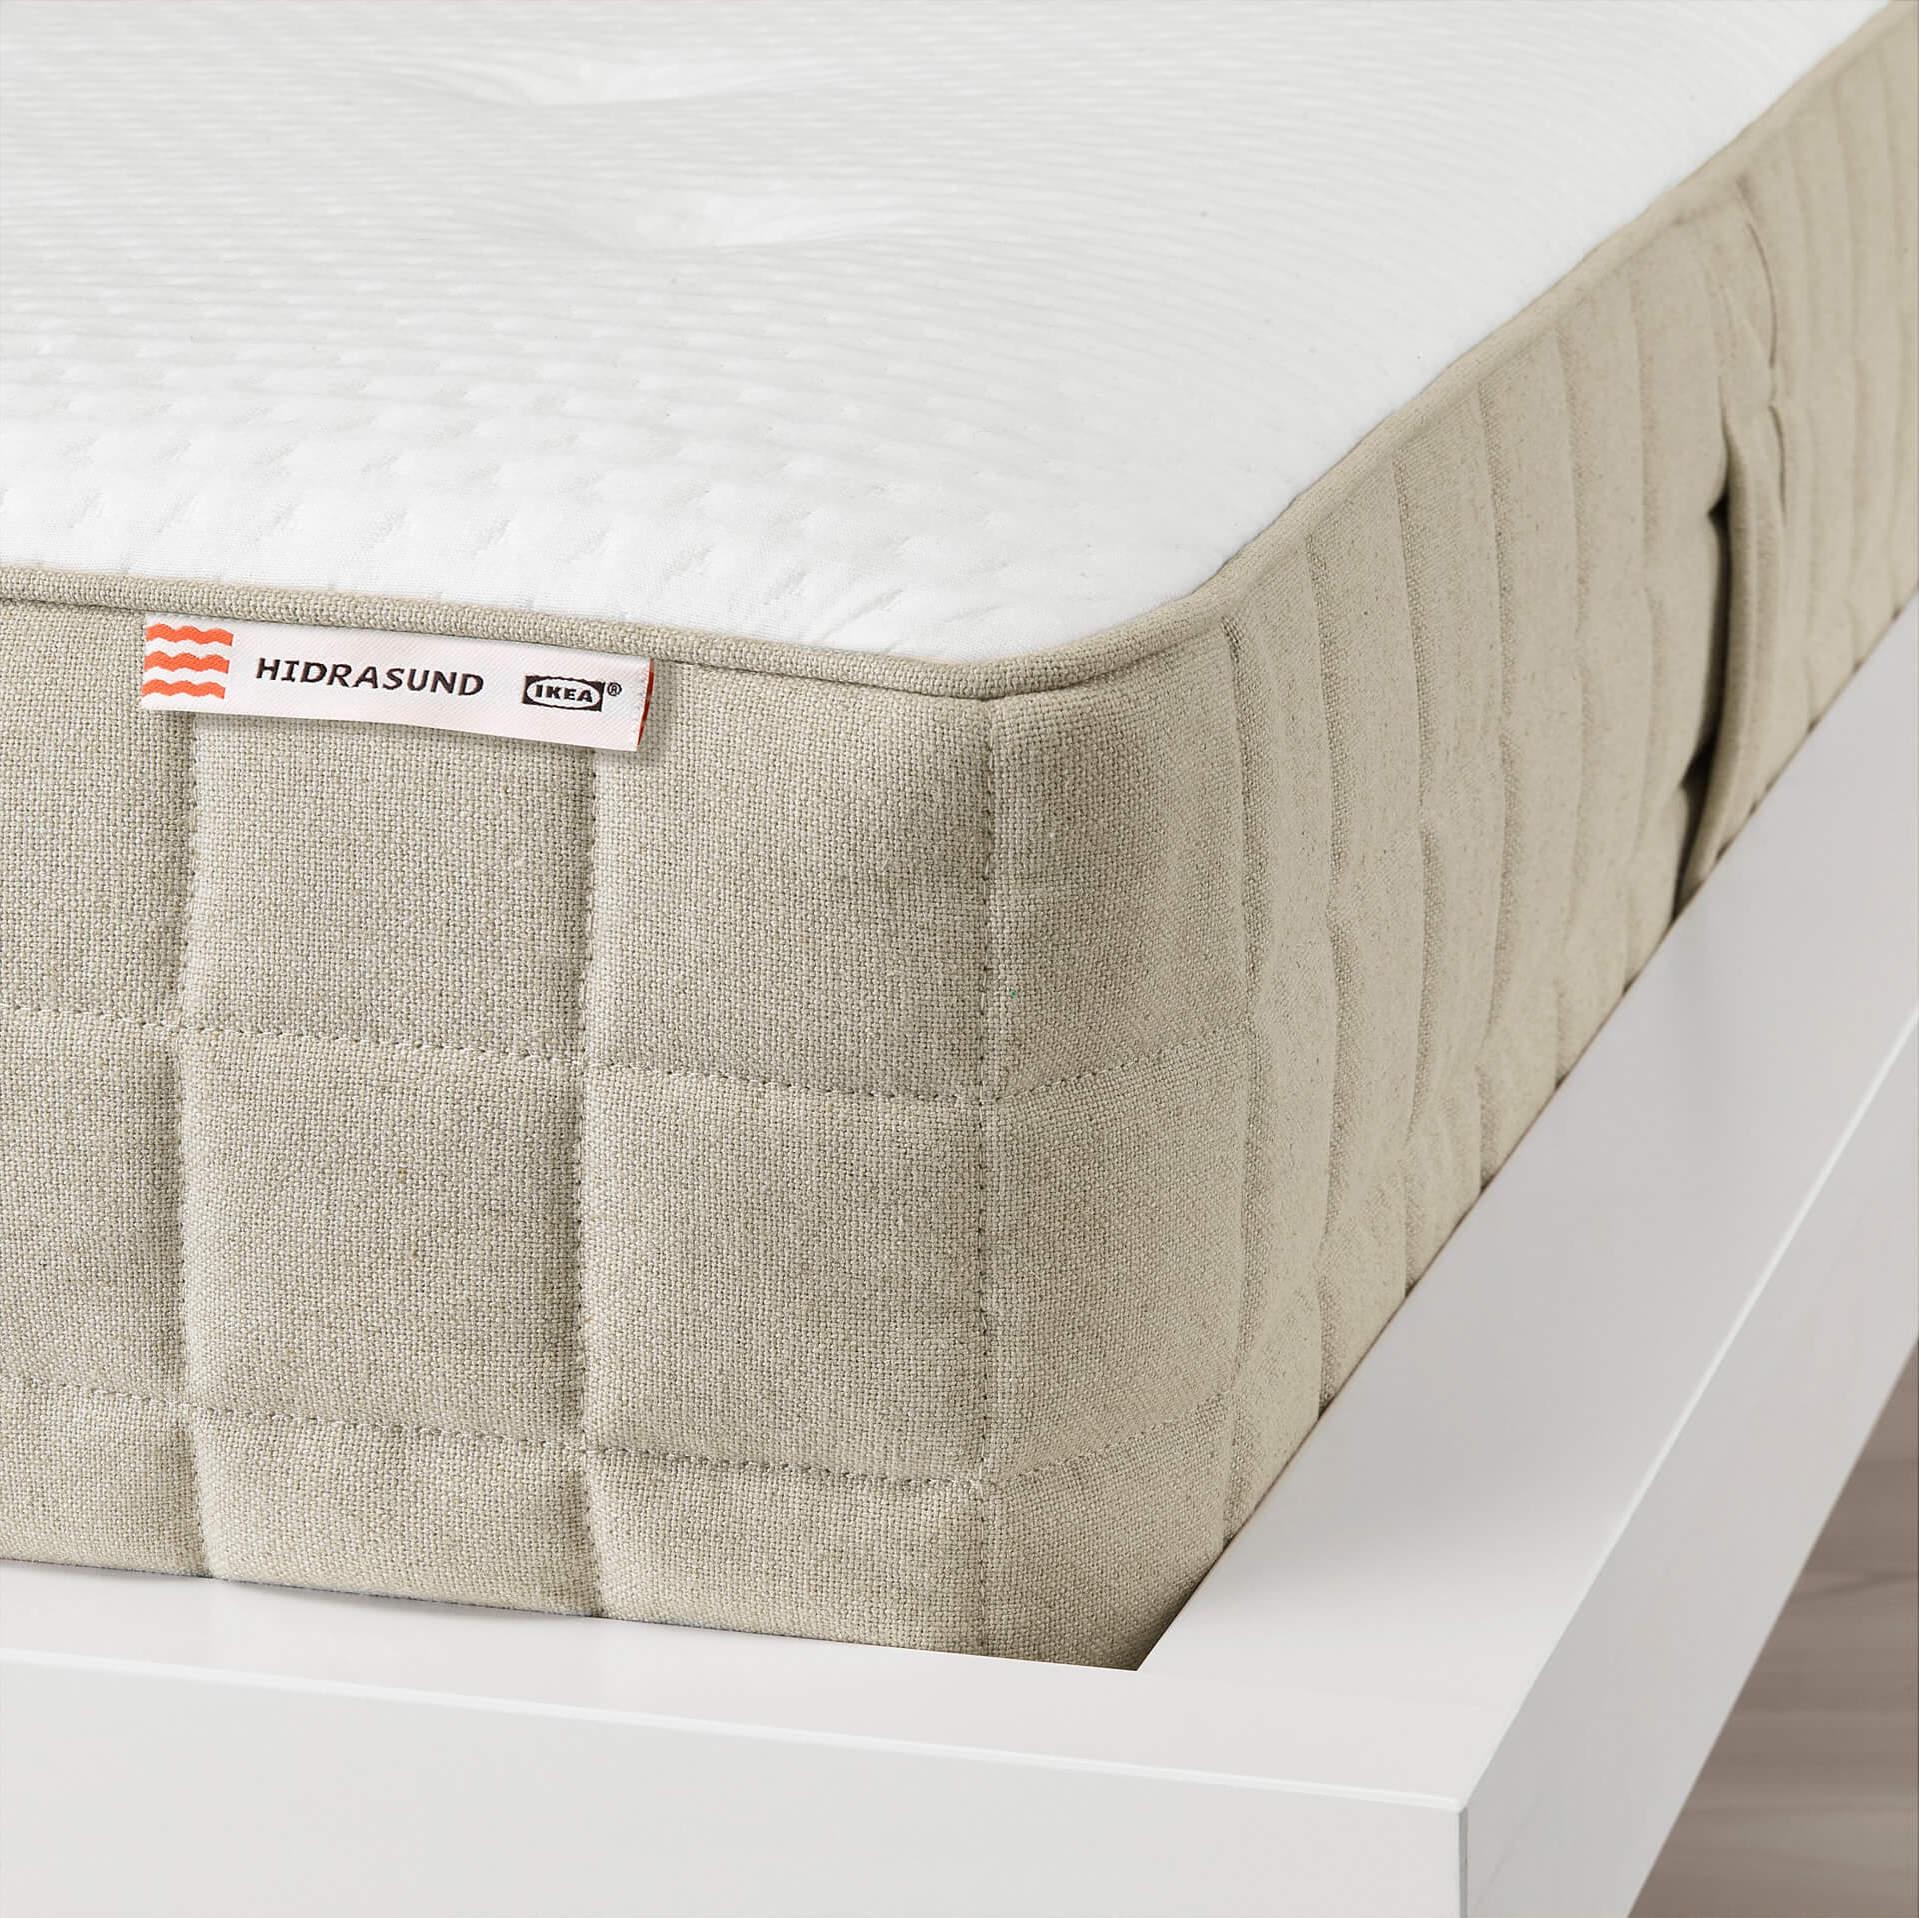 IKEA Hidrasund Matratze